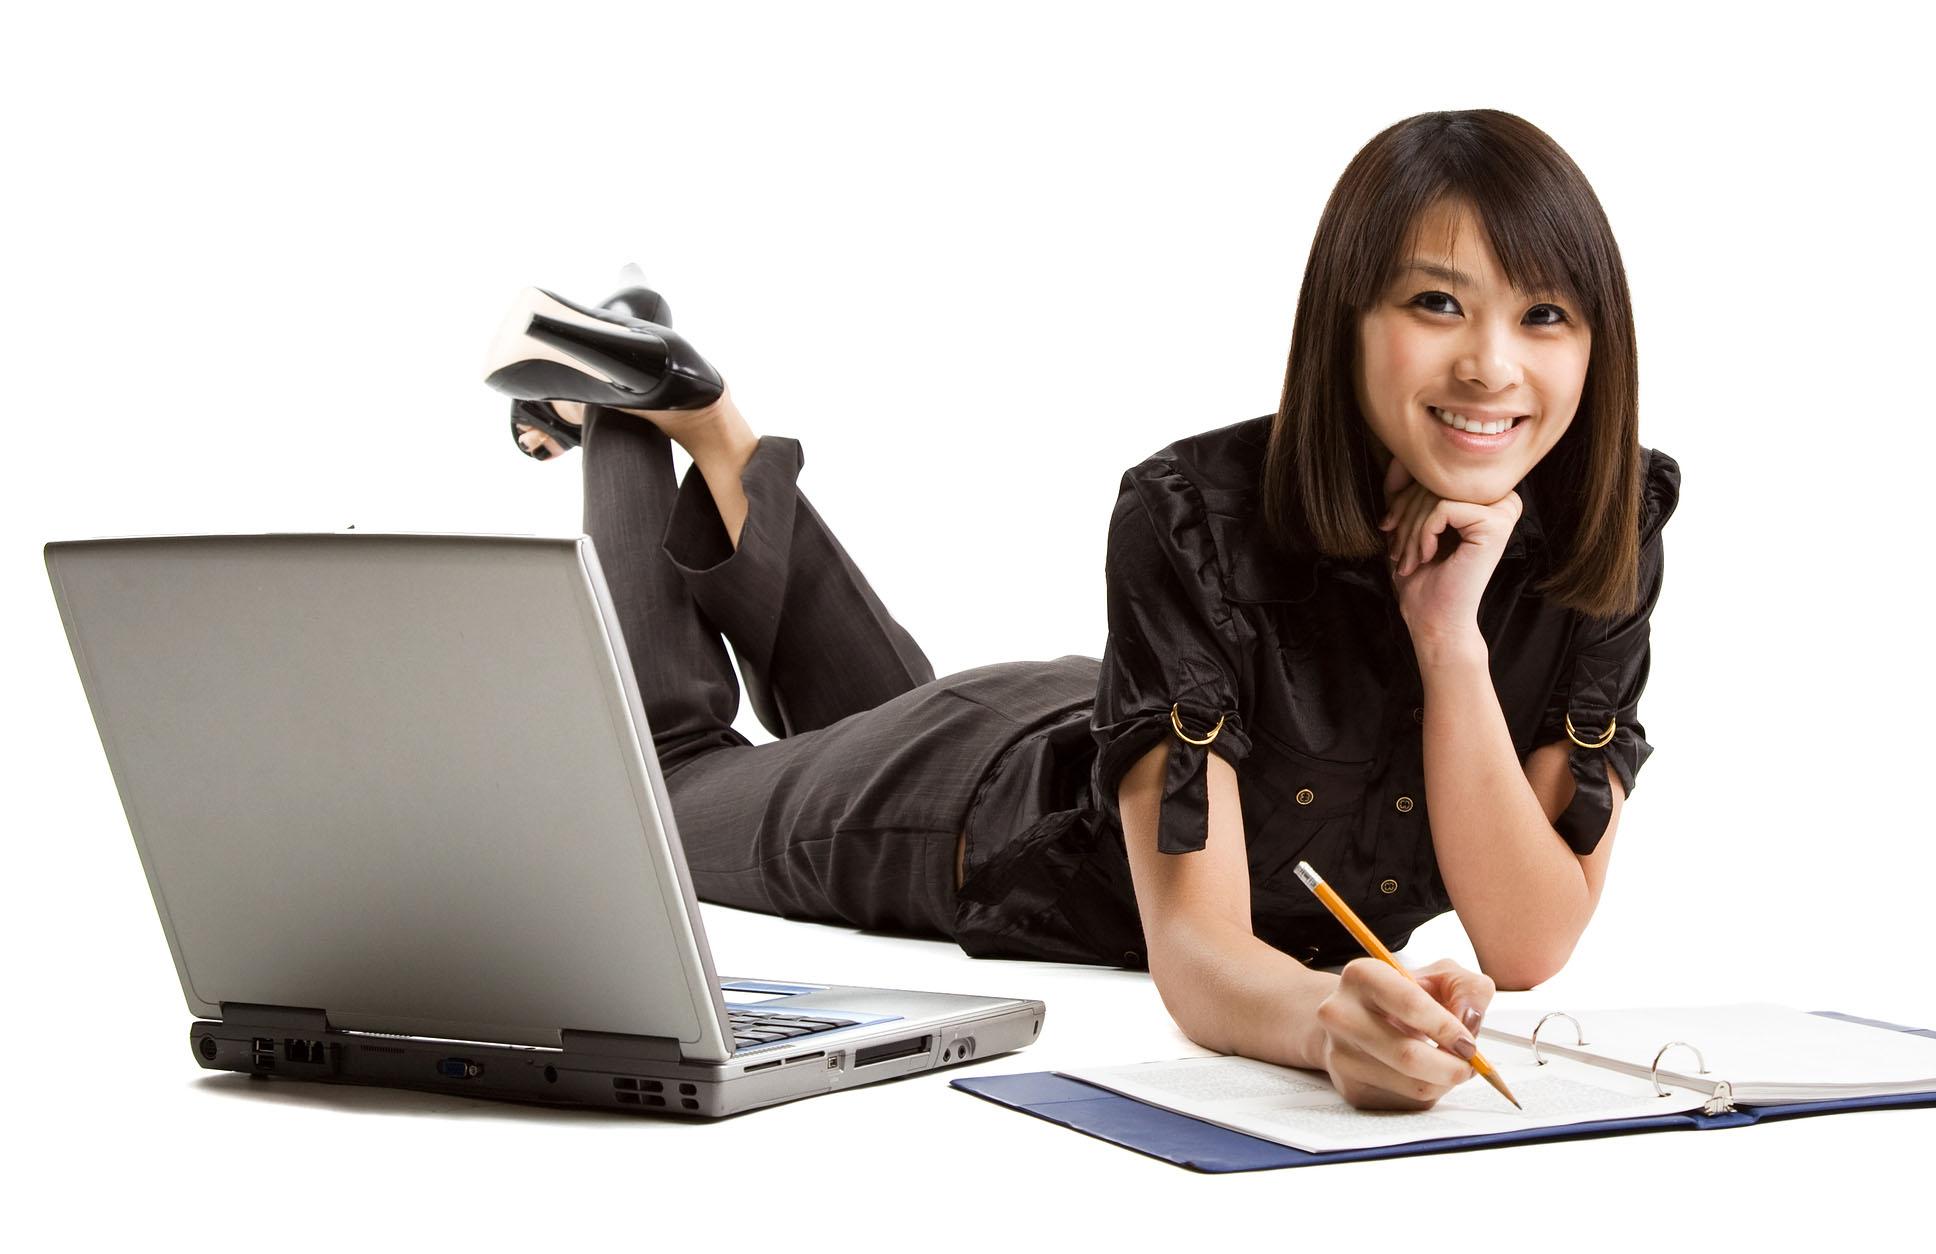 Persuasive essay on electronic media